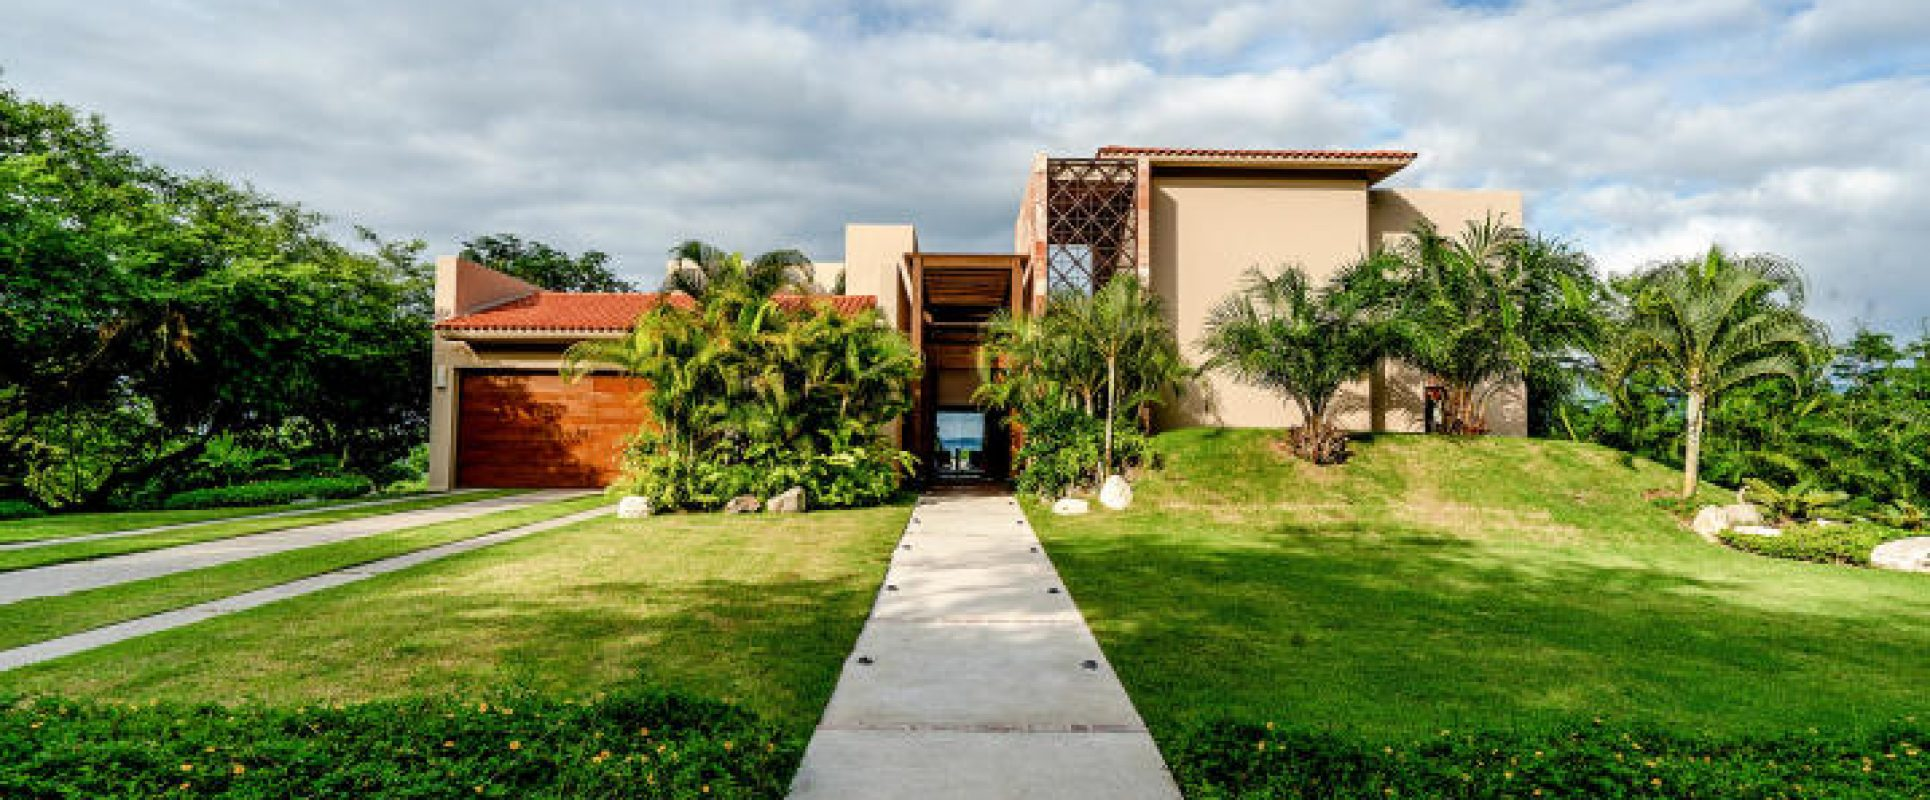 Villa Bahia Pelicanos Photo